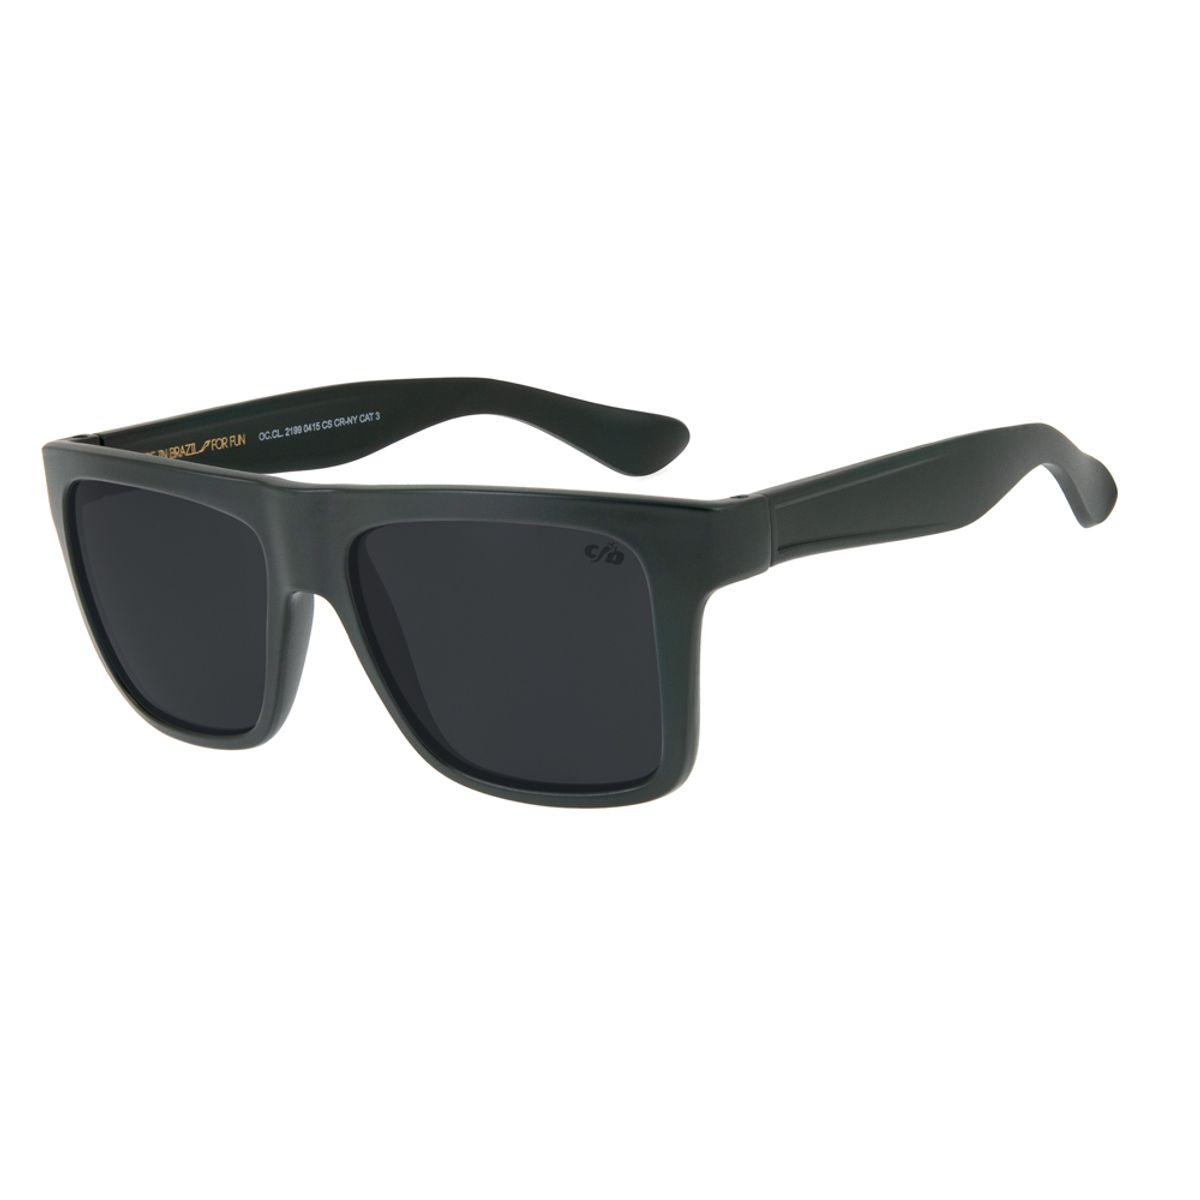 485f778bb247c Óculos de Sol Chilli Beans Masculino Bossa Nova Verde 2199 - Chilli ...